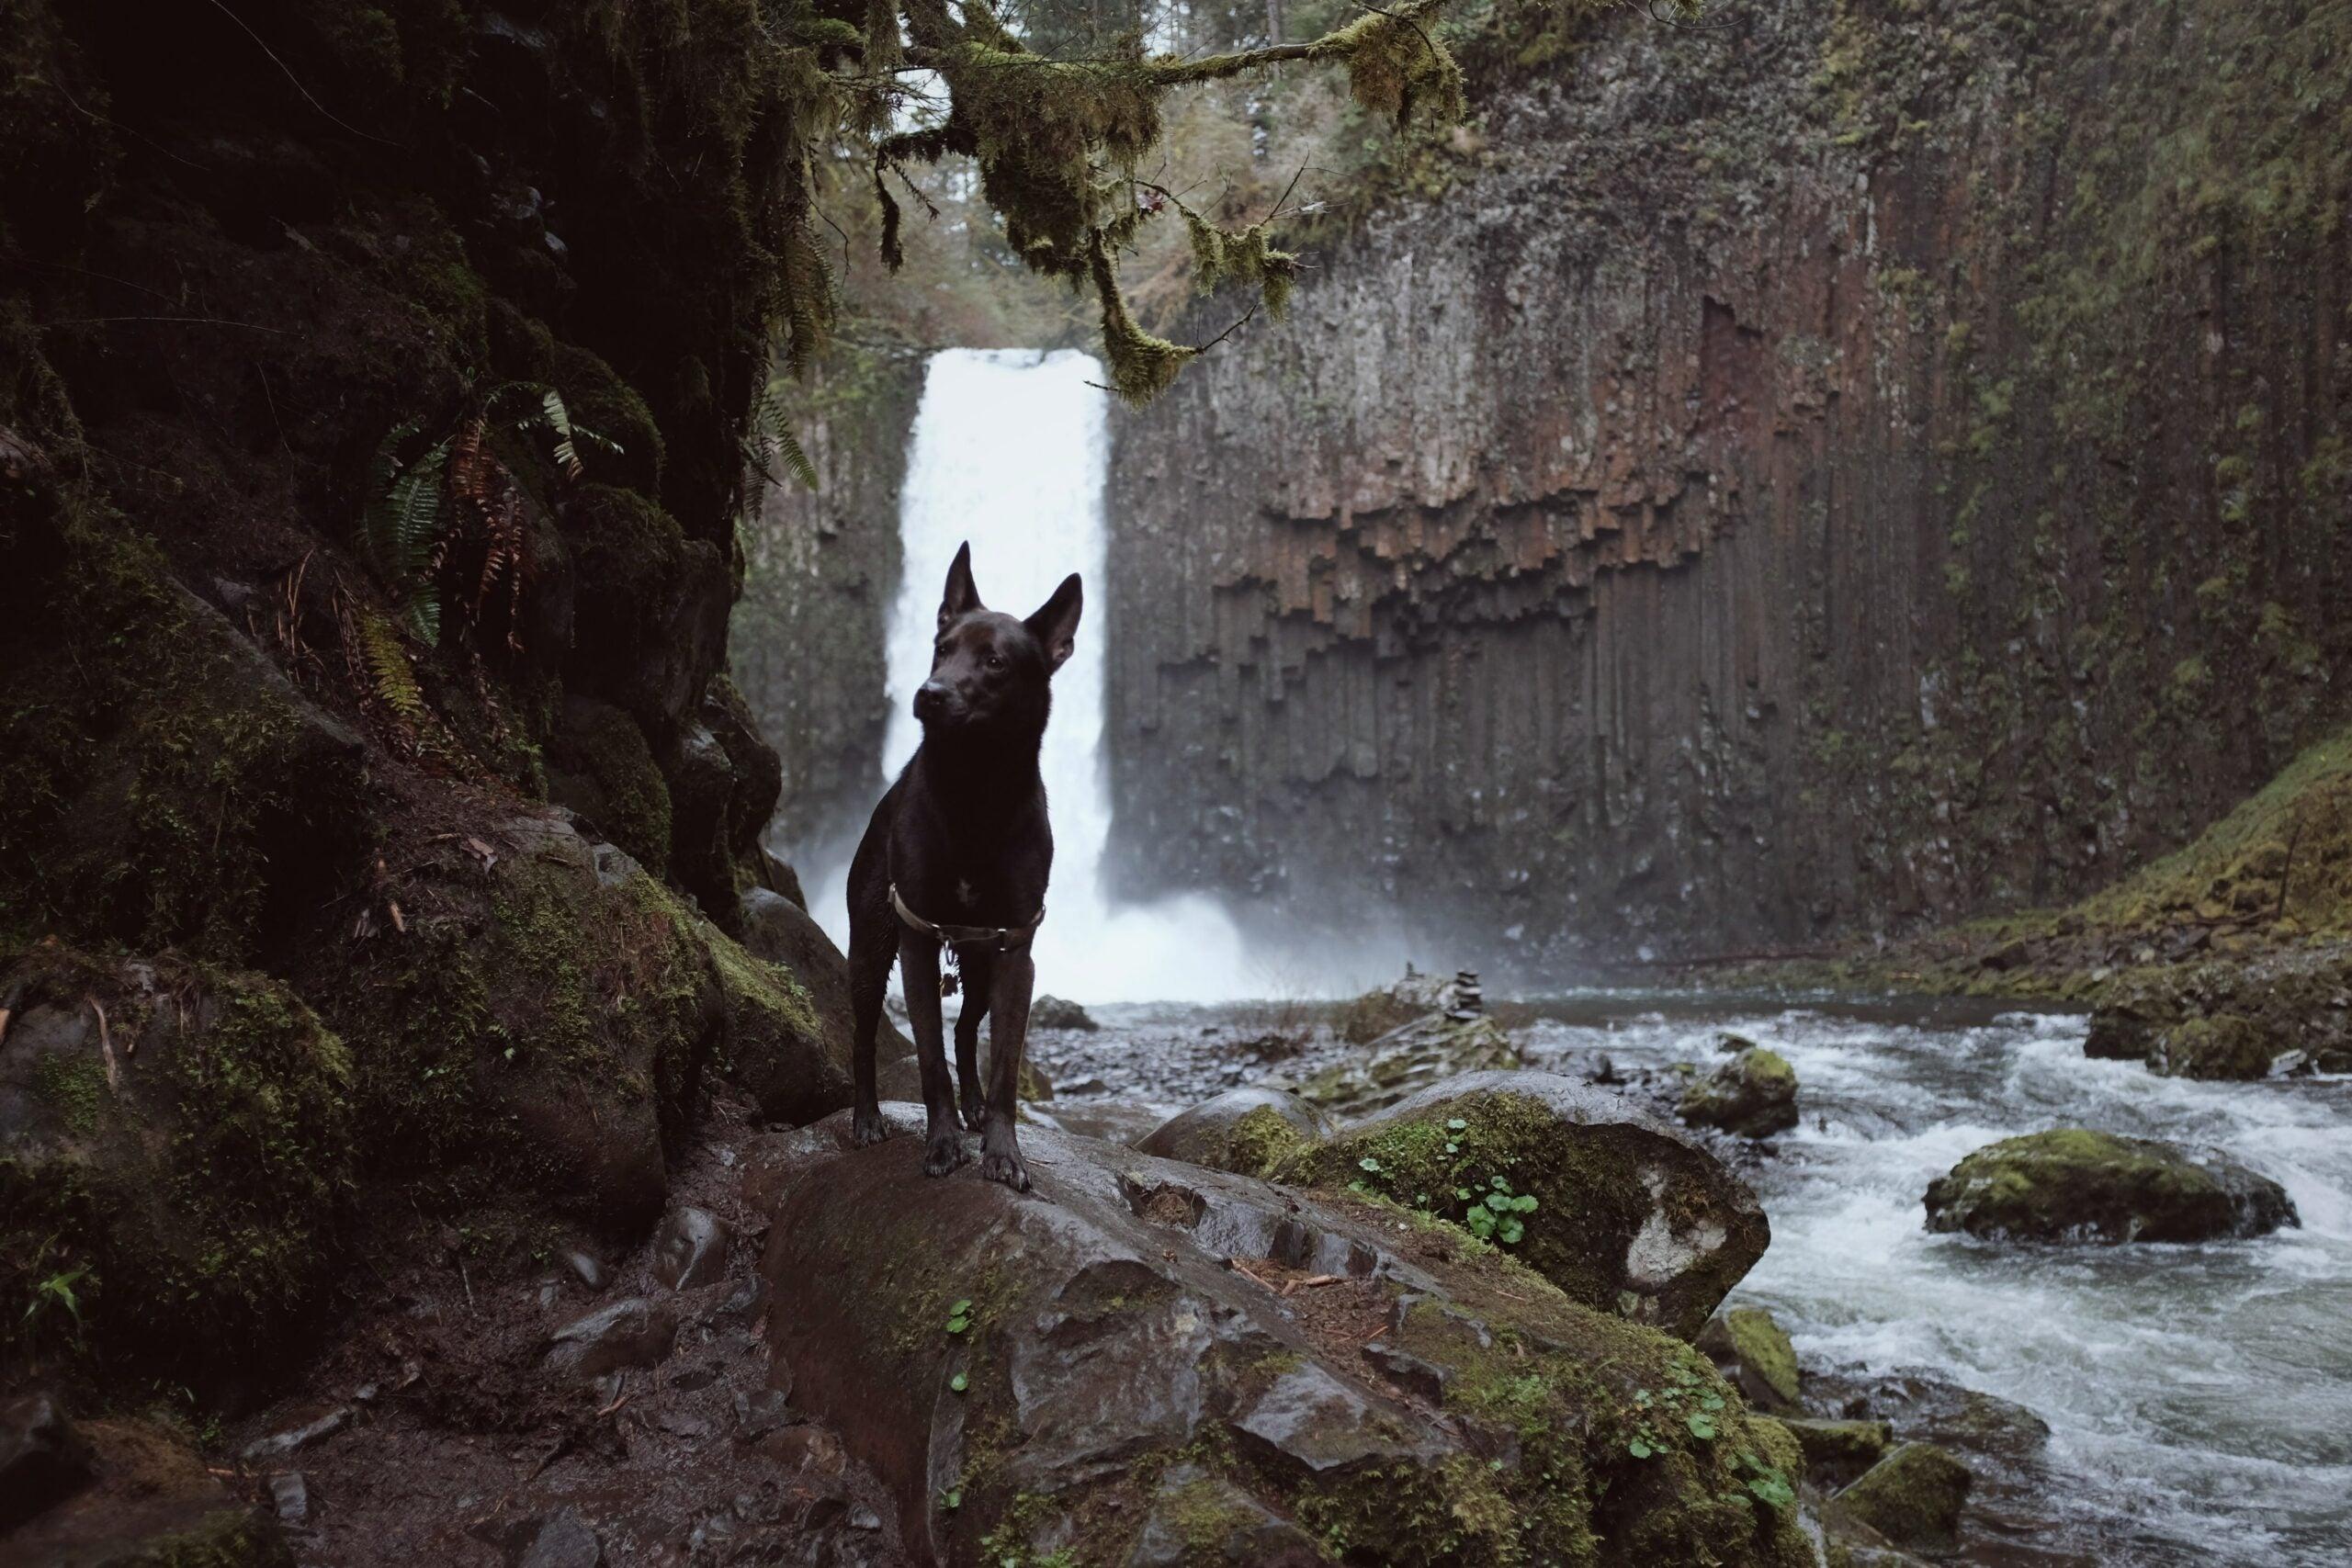 A black shepherd dog along a river